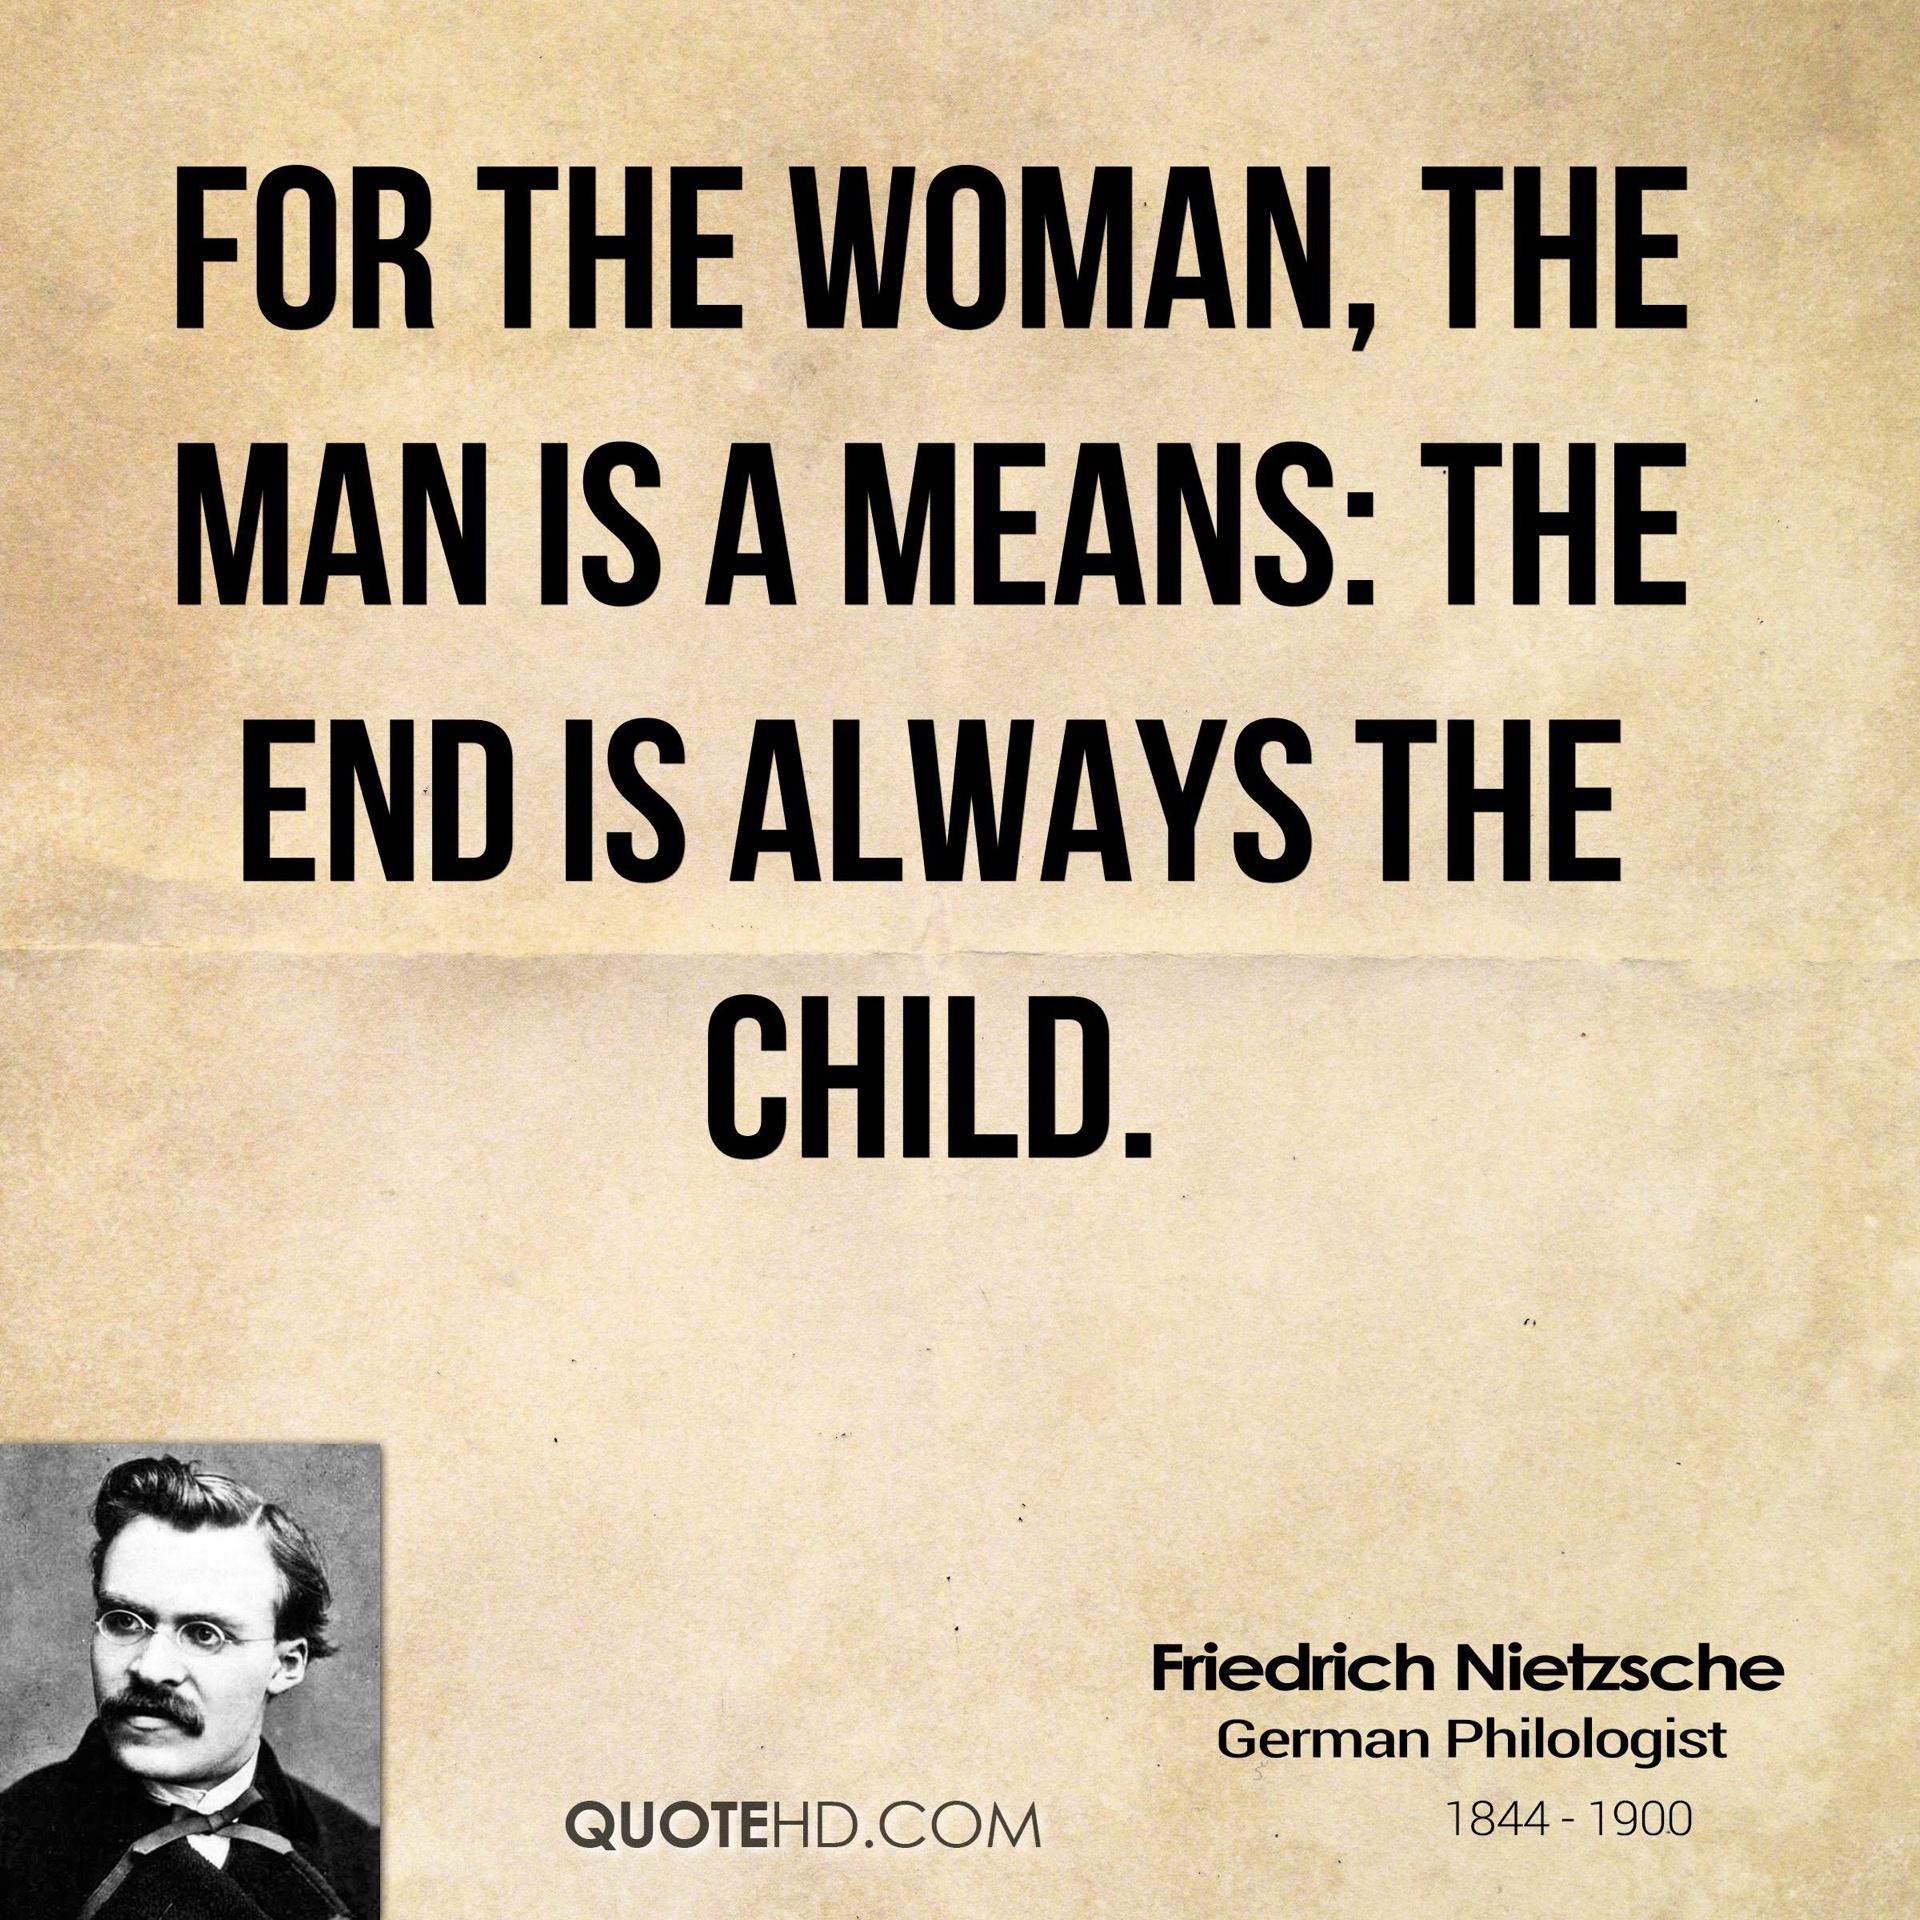 What Were Nietzsches Views On Women Quora